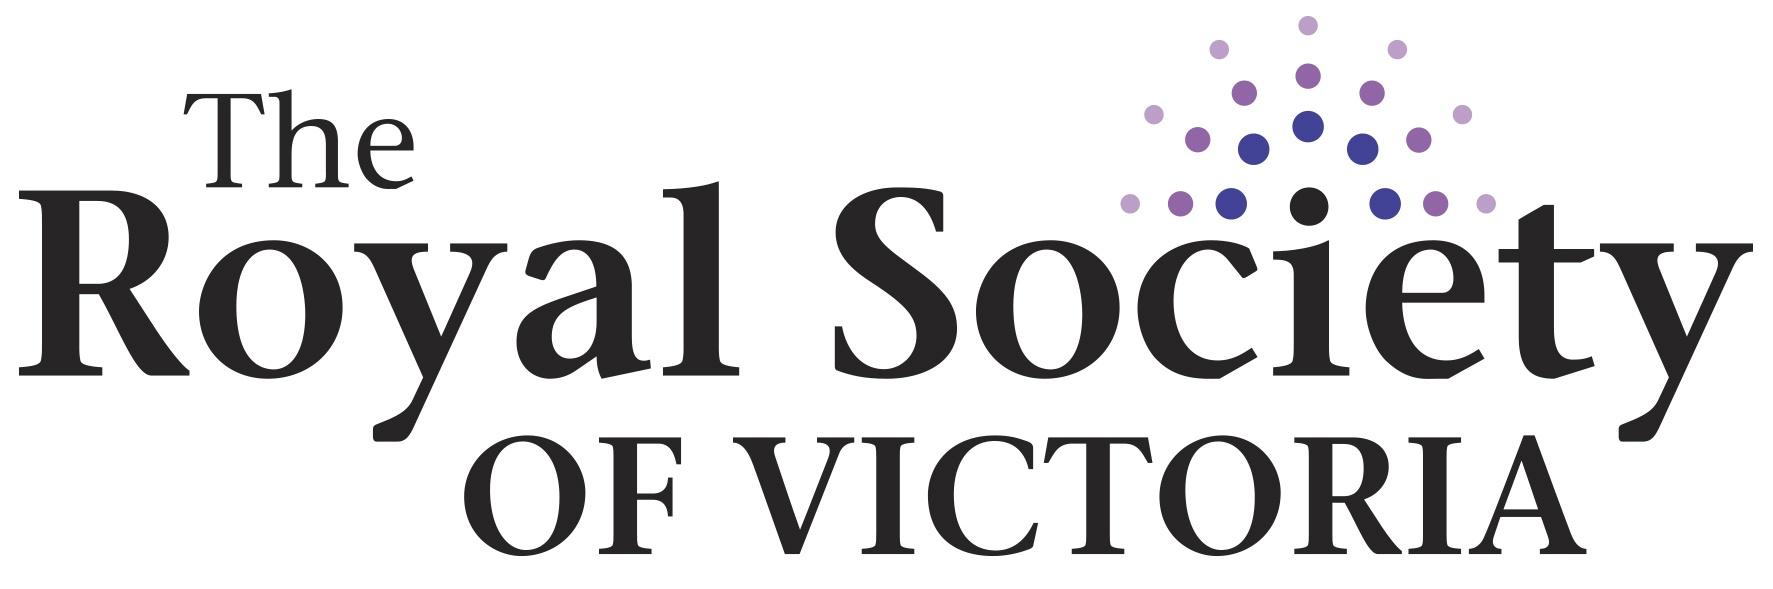 Royal Society of Victoria logo